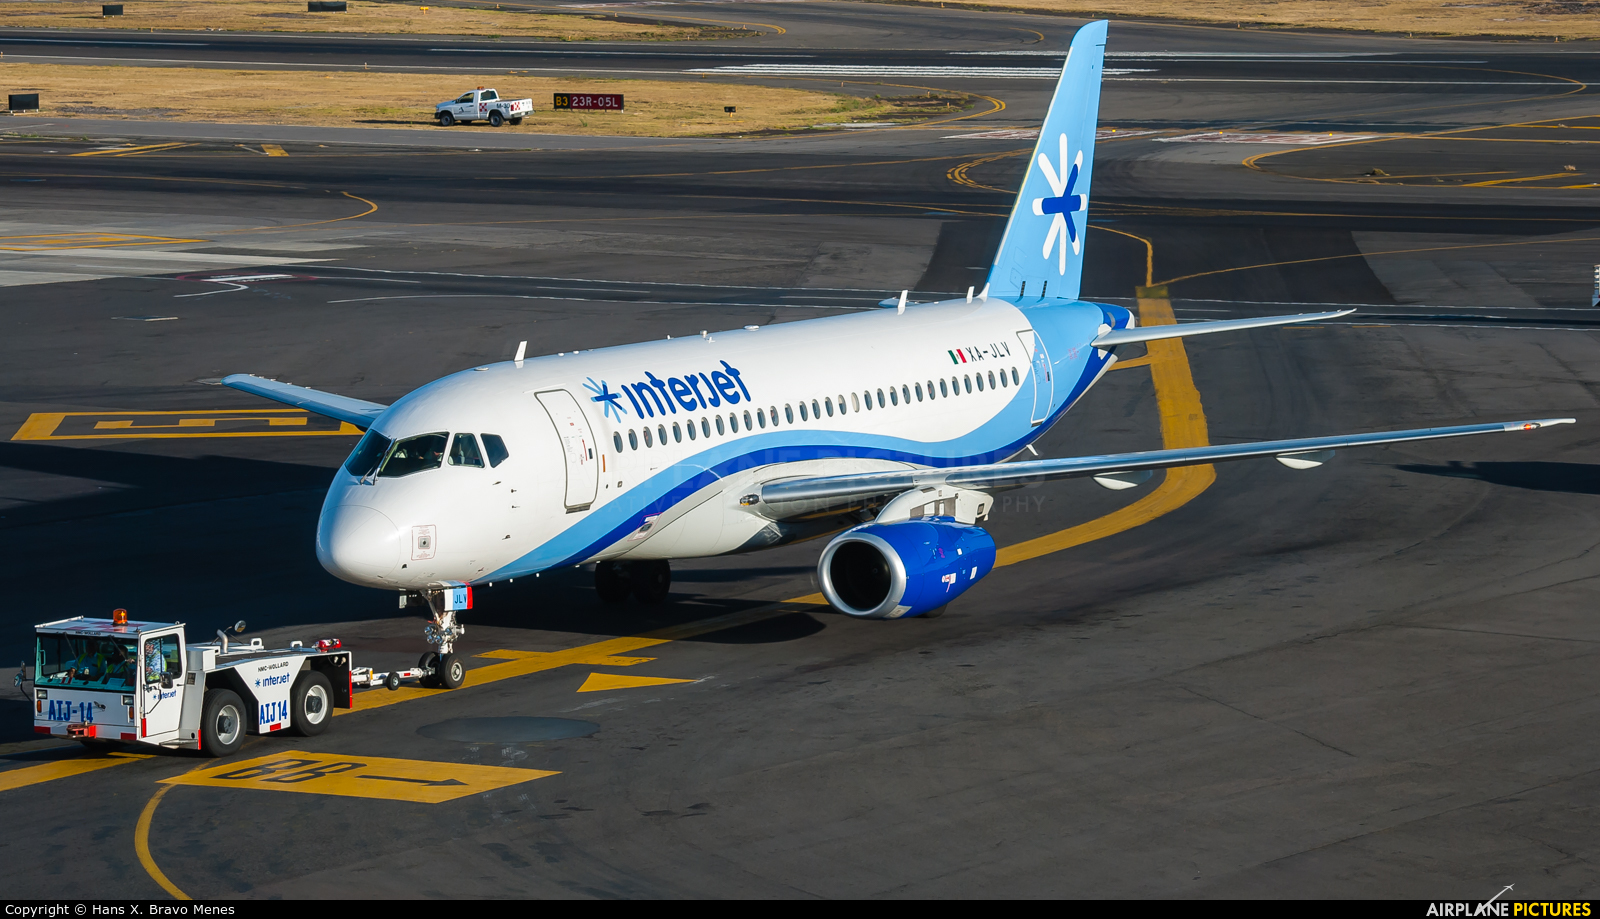 Interjet XA-JLV aircraft at Mexico City - Licenciado Benito Juarez Intl